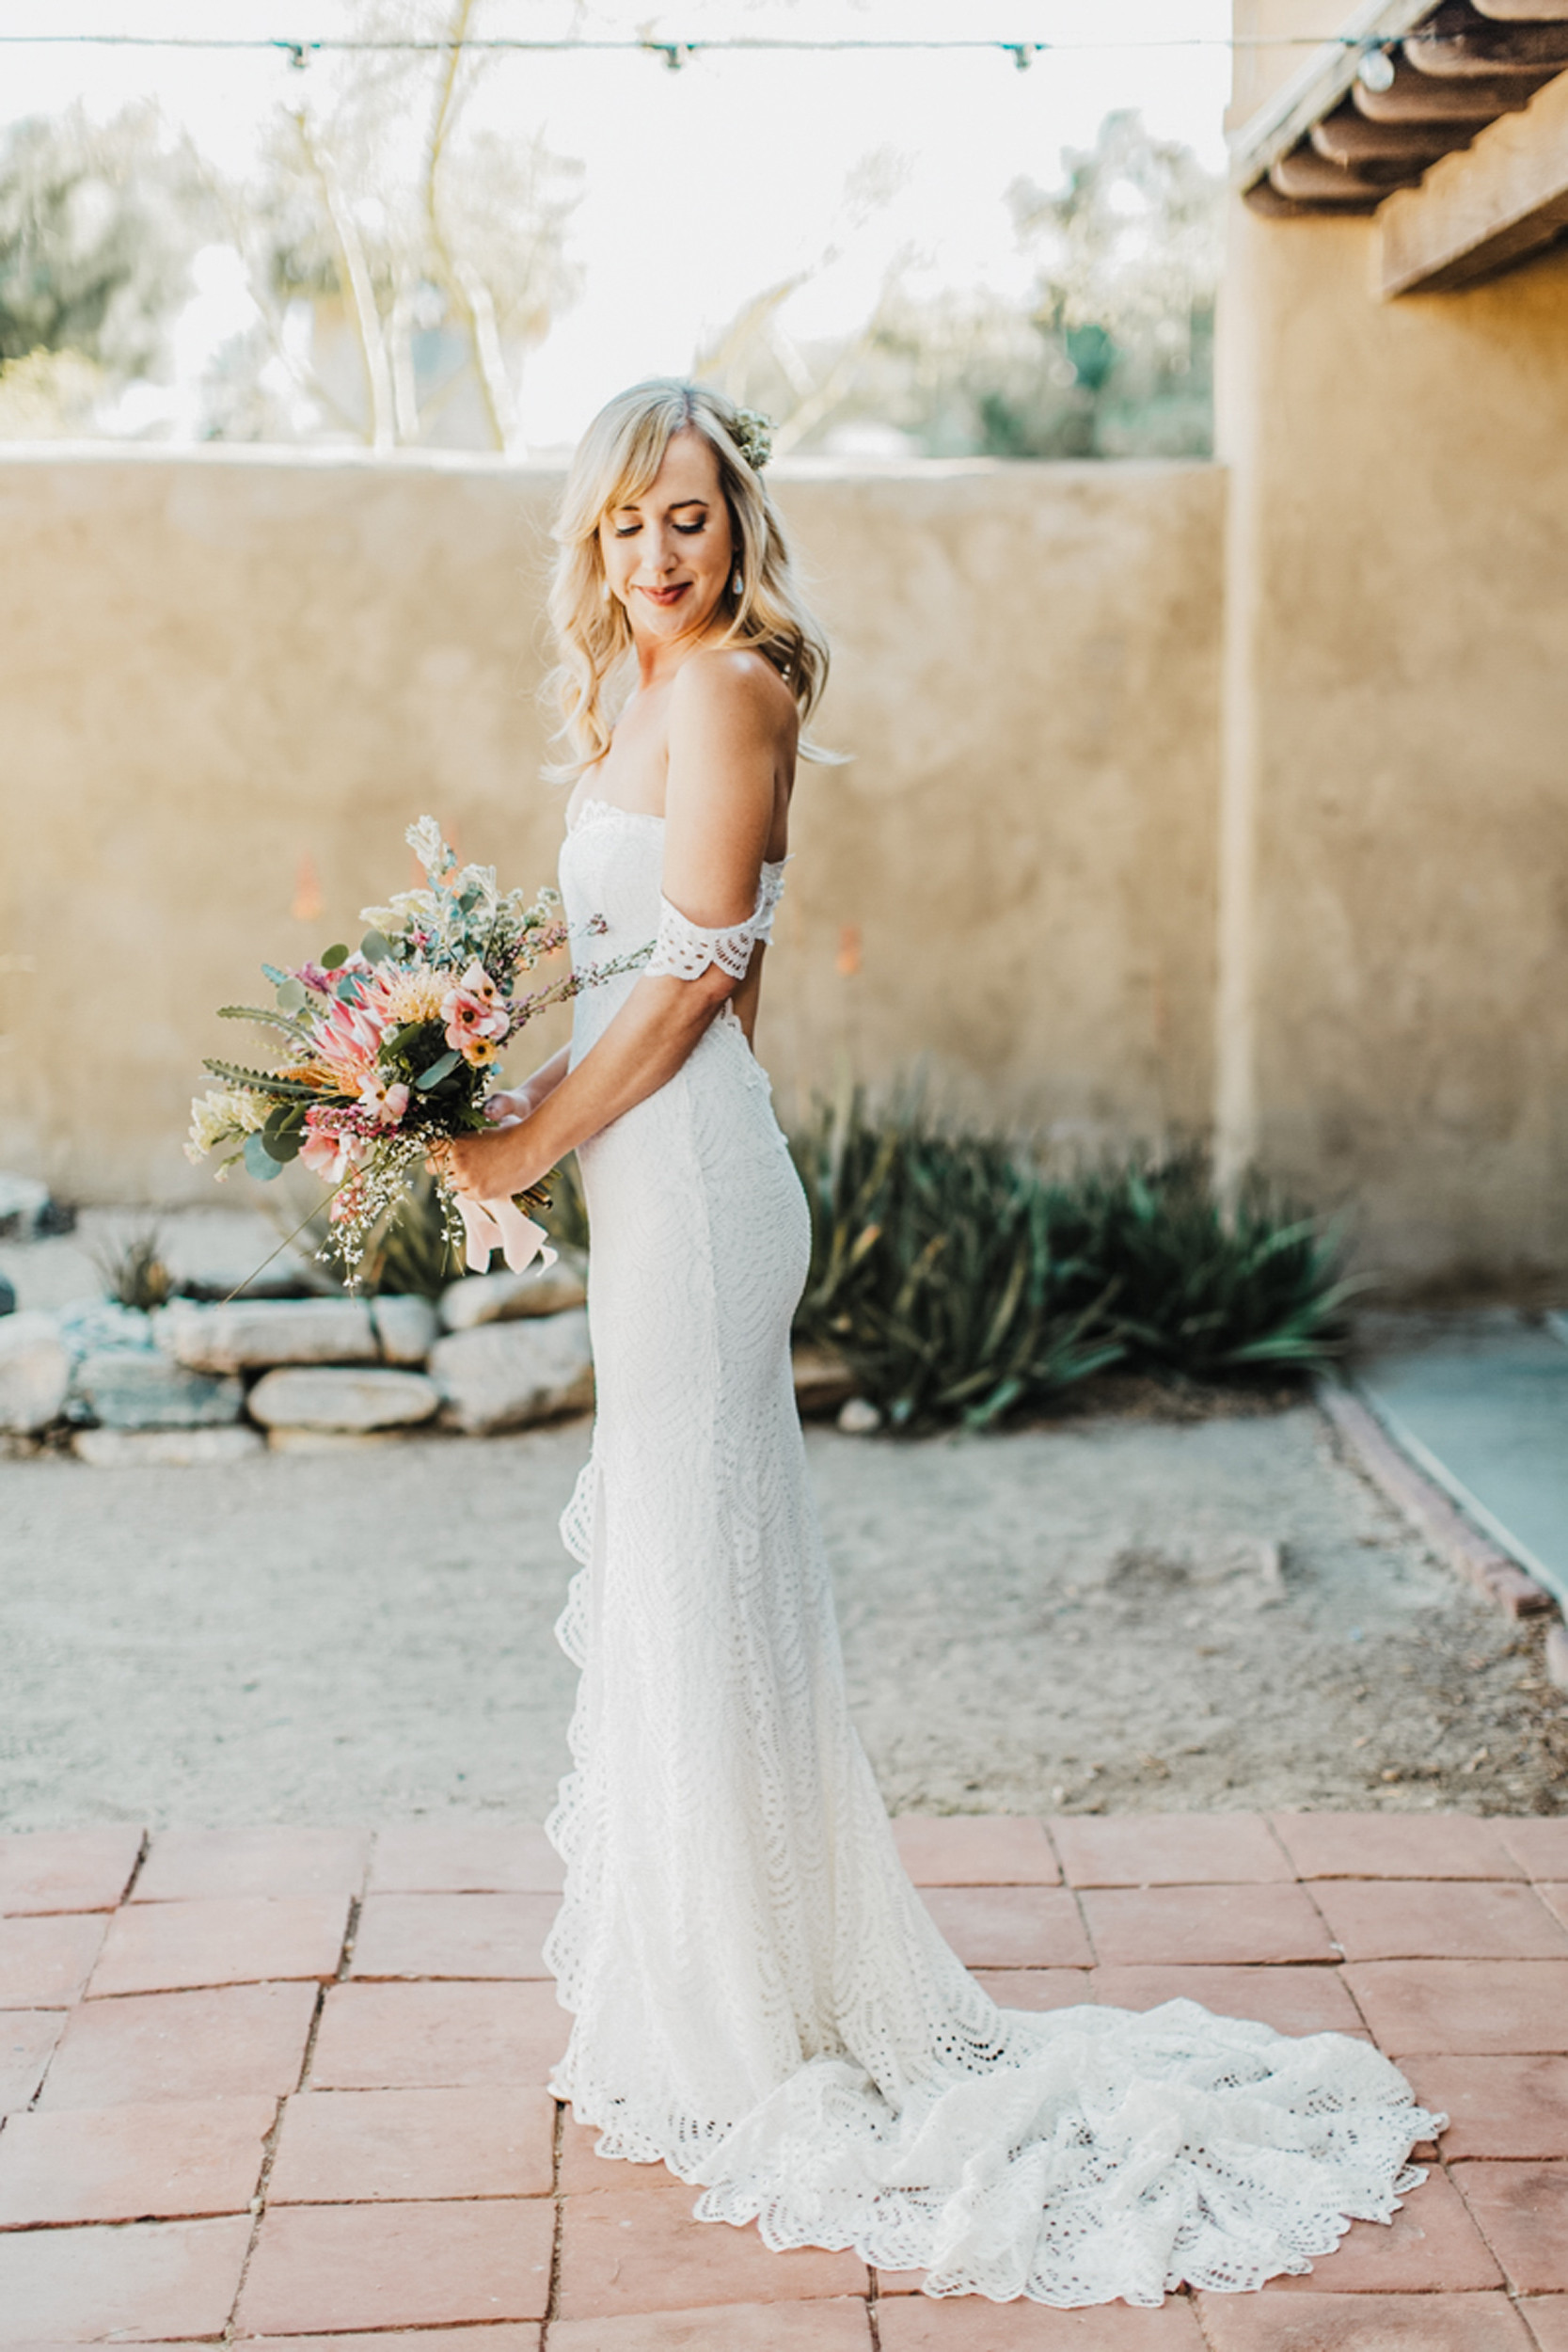 bride wearing off the shoulder wedding dress holding bouquet